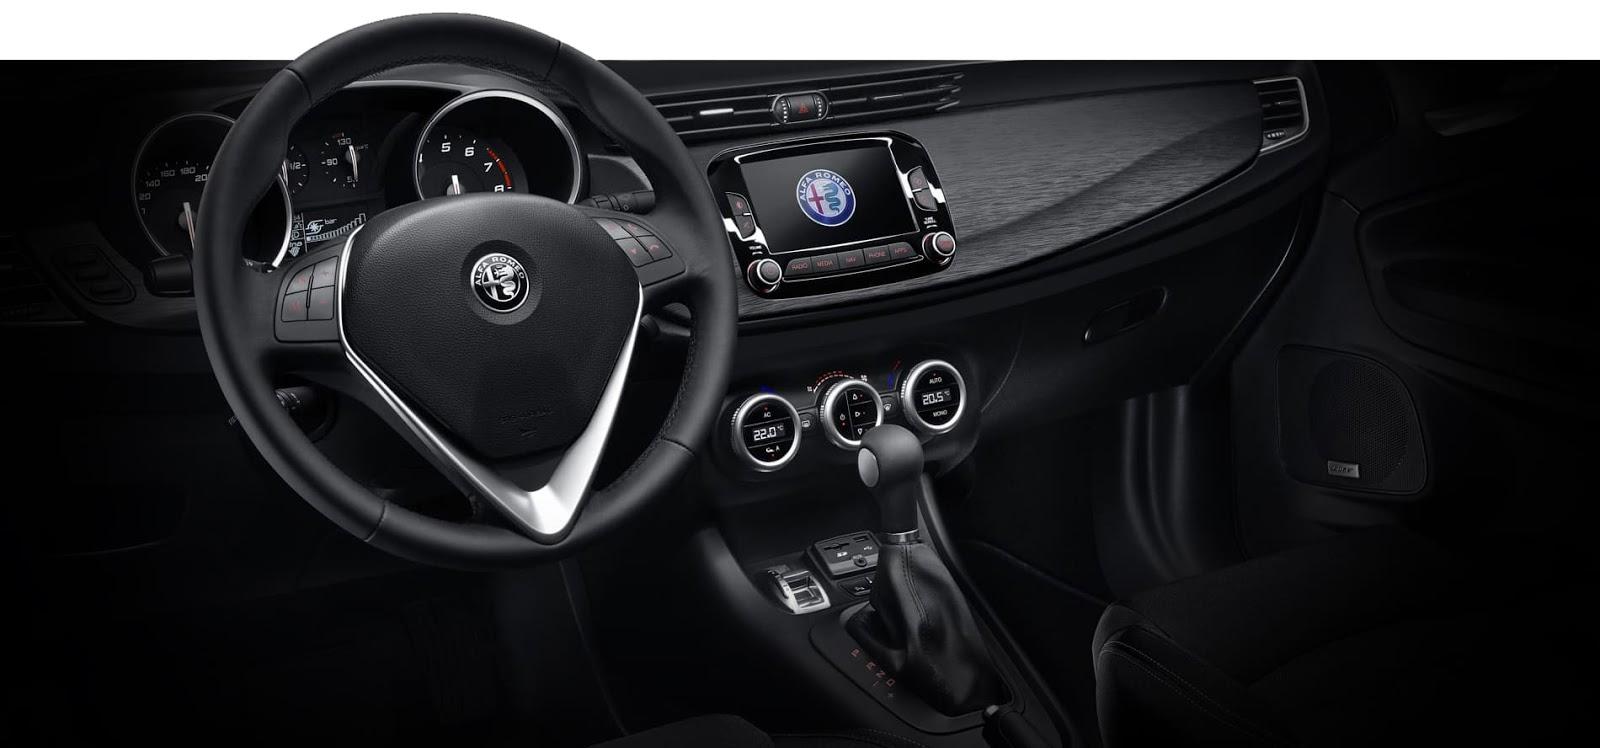 giulietta super interiors Νέα έκδοση Alfa Romeo Giulietta SUPER, με SUPER τιμή!